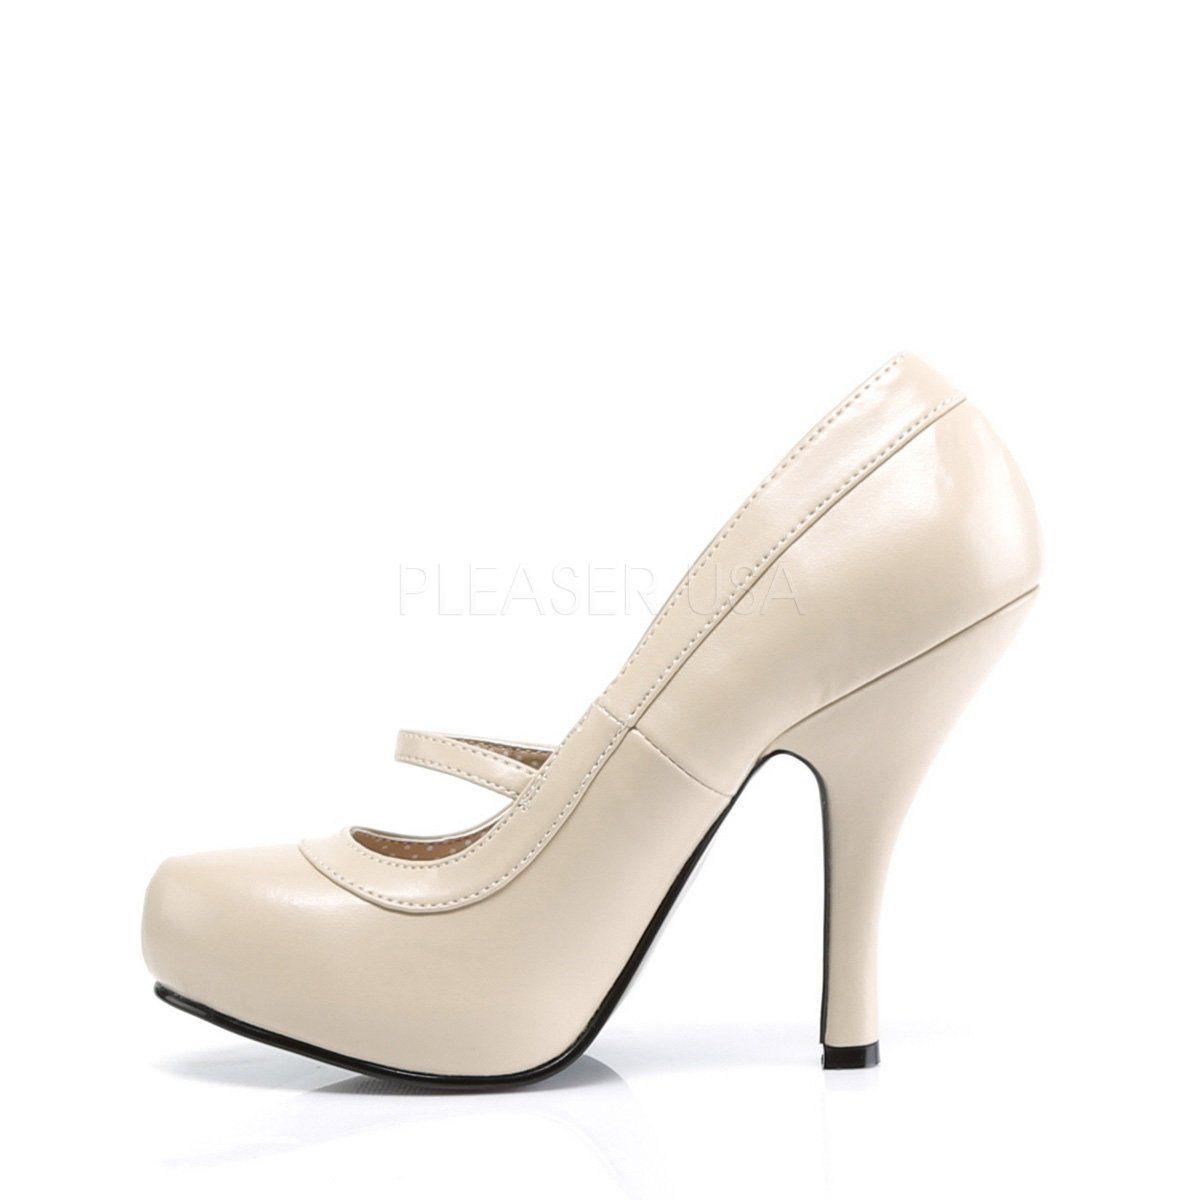 4444aebd6ac1 Pin Up Couture - CUTIEPIE-02 - Cream Pu - Platforms